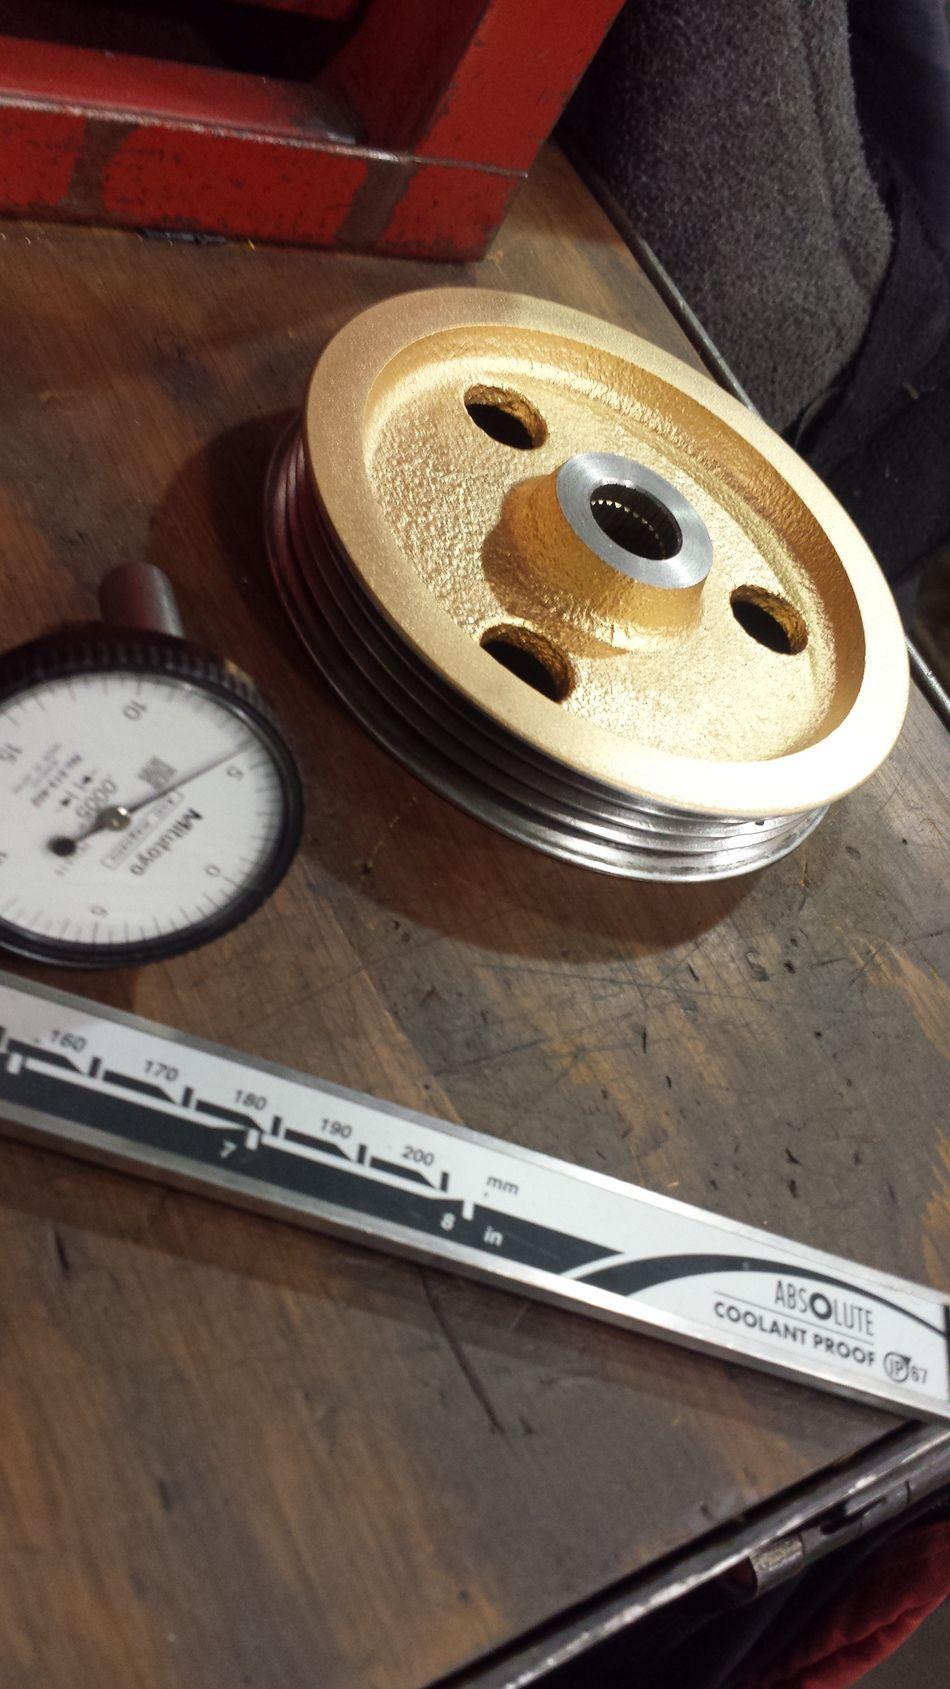 Wheel Mecanic Tuning Car Machinery Metal Turning Macro Restoration Steel Machine Tool Workshop